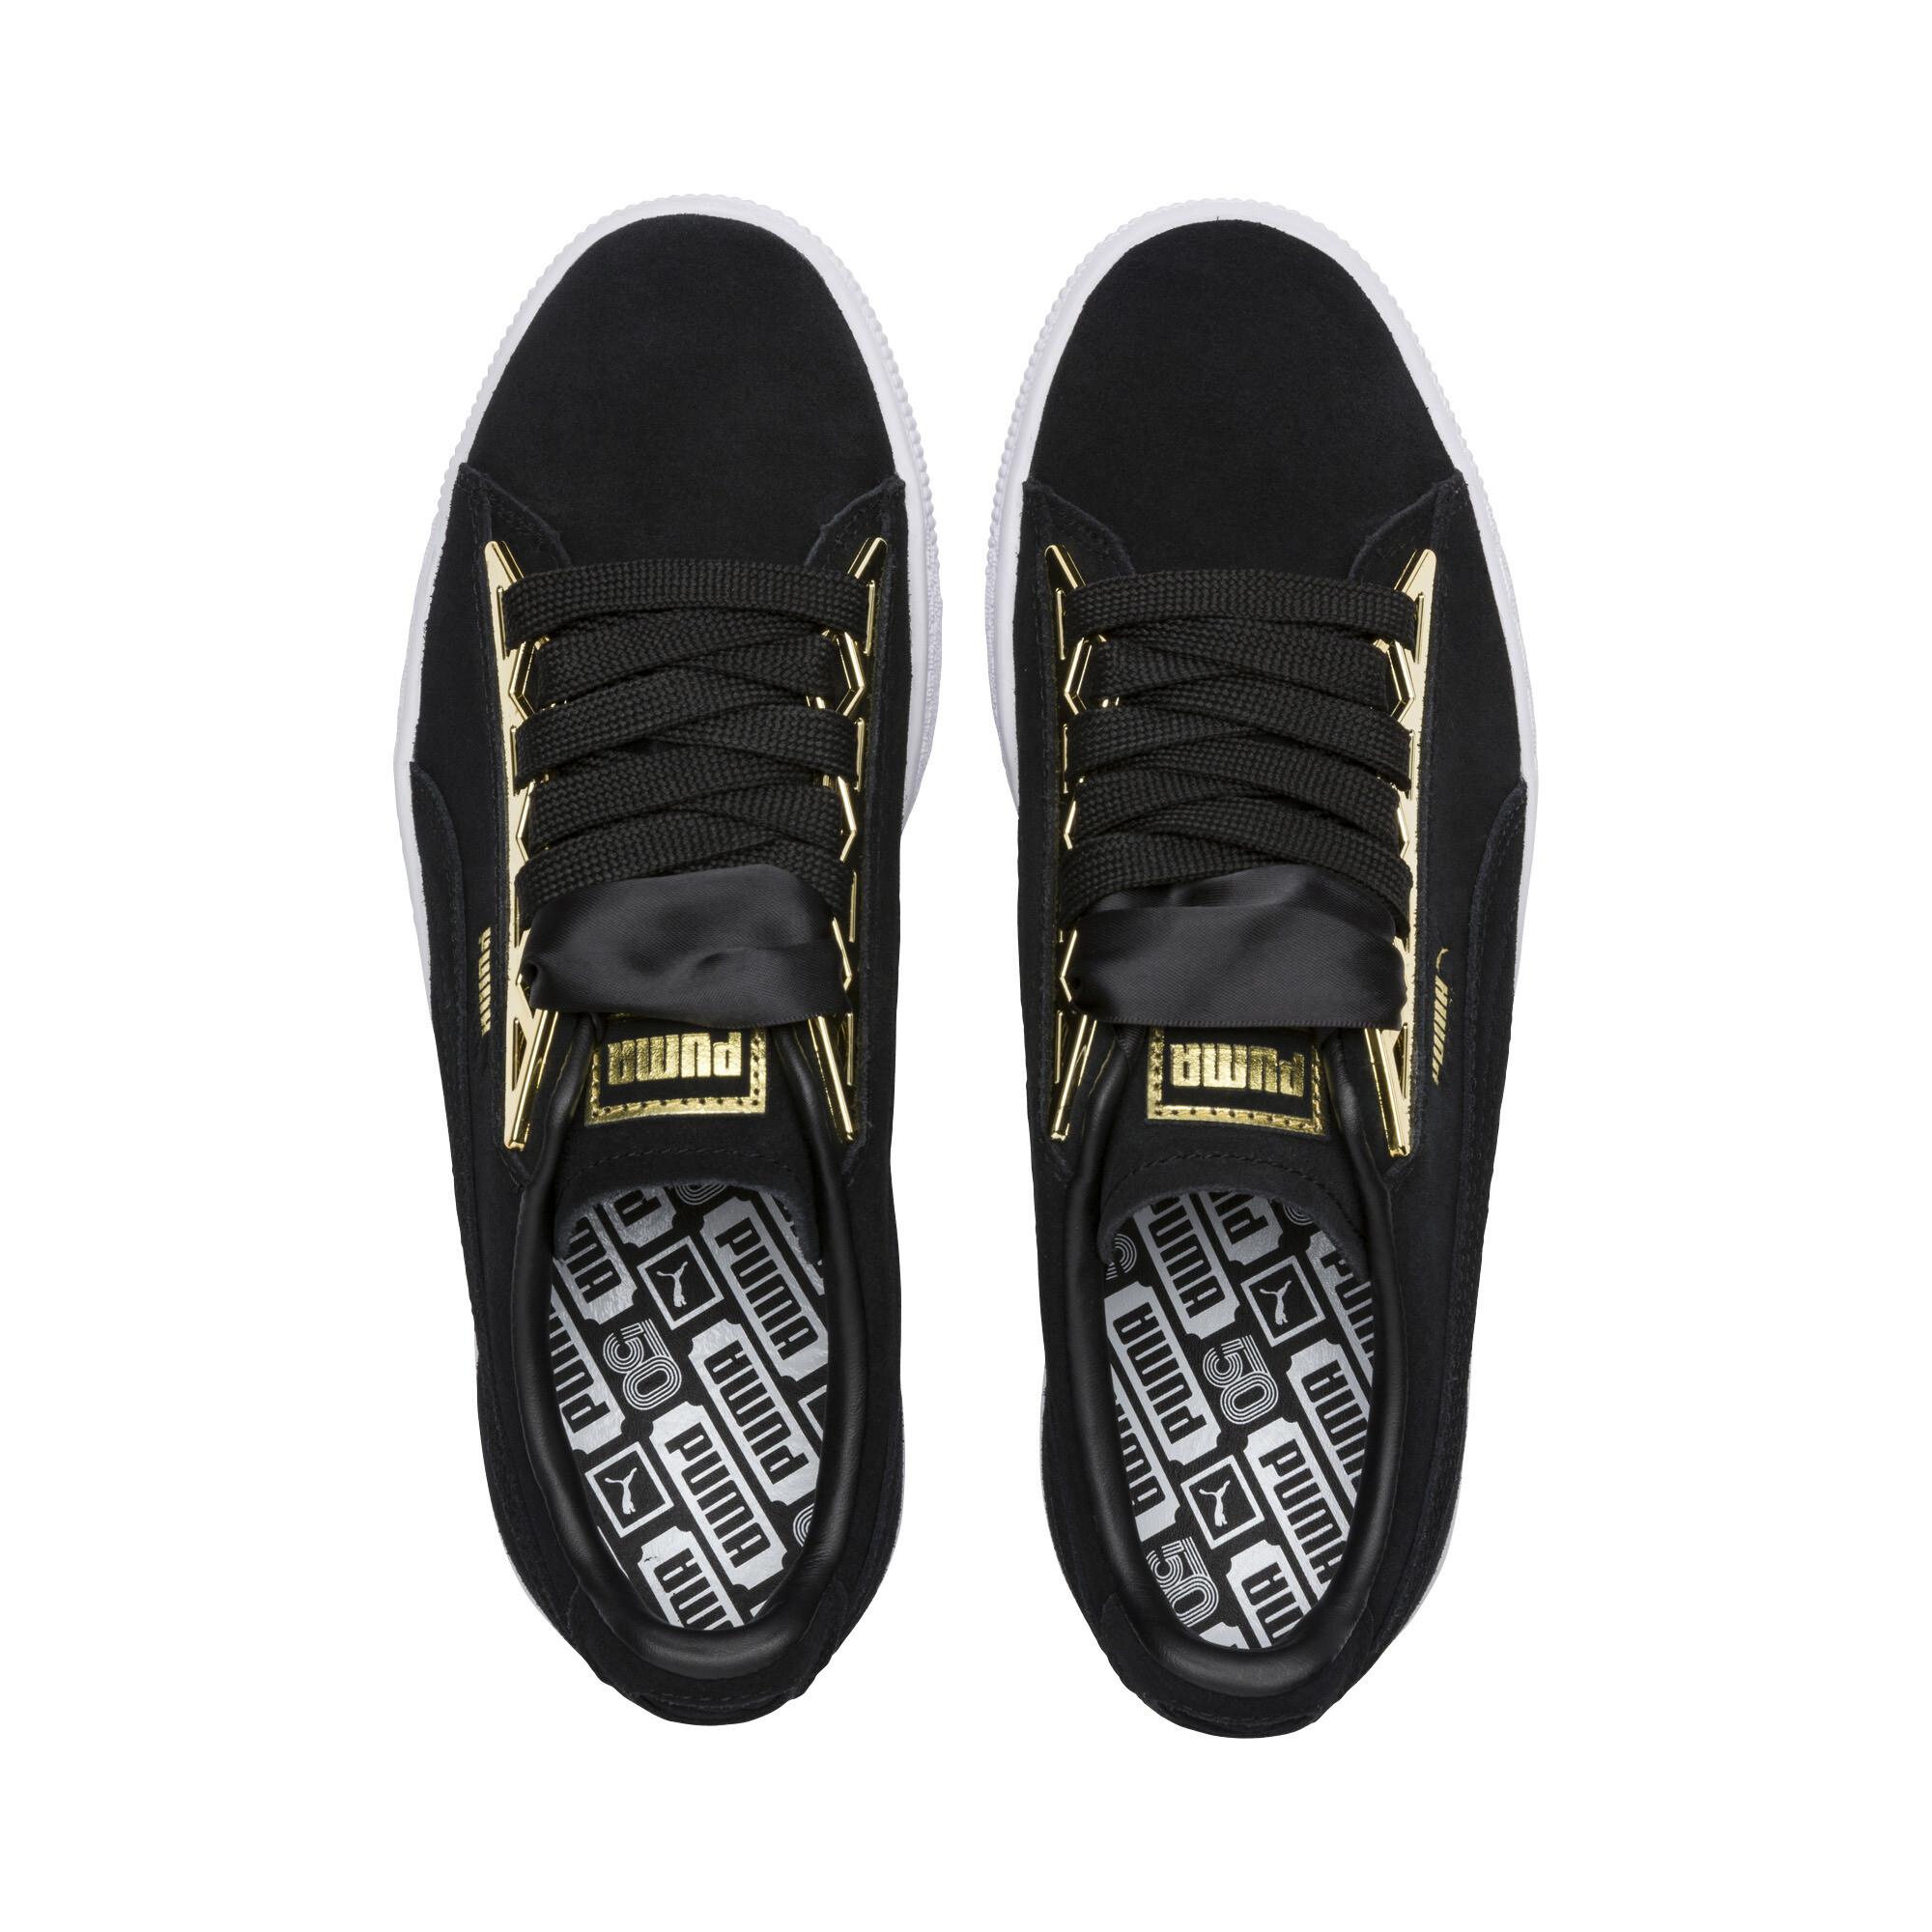 promo code 21f48 6c02a Details about PUMA Suede Jewel Metallic Women's Sneakers Women Shoe Sport  Classics